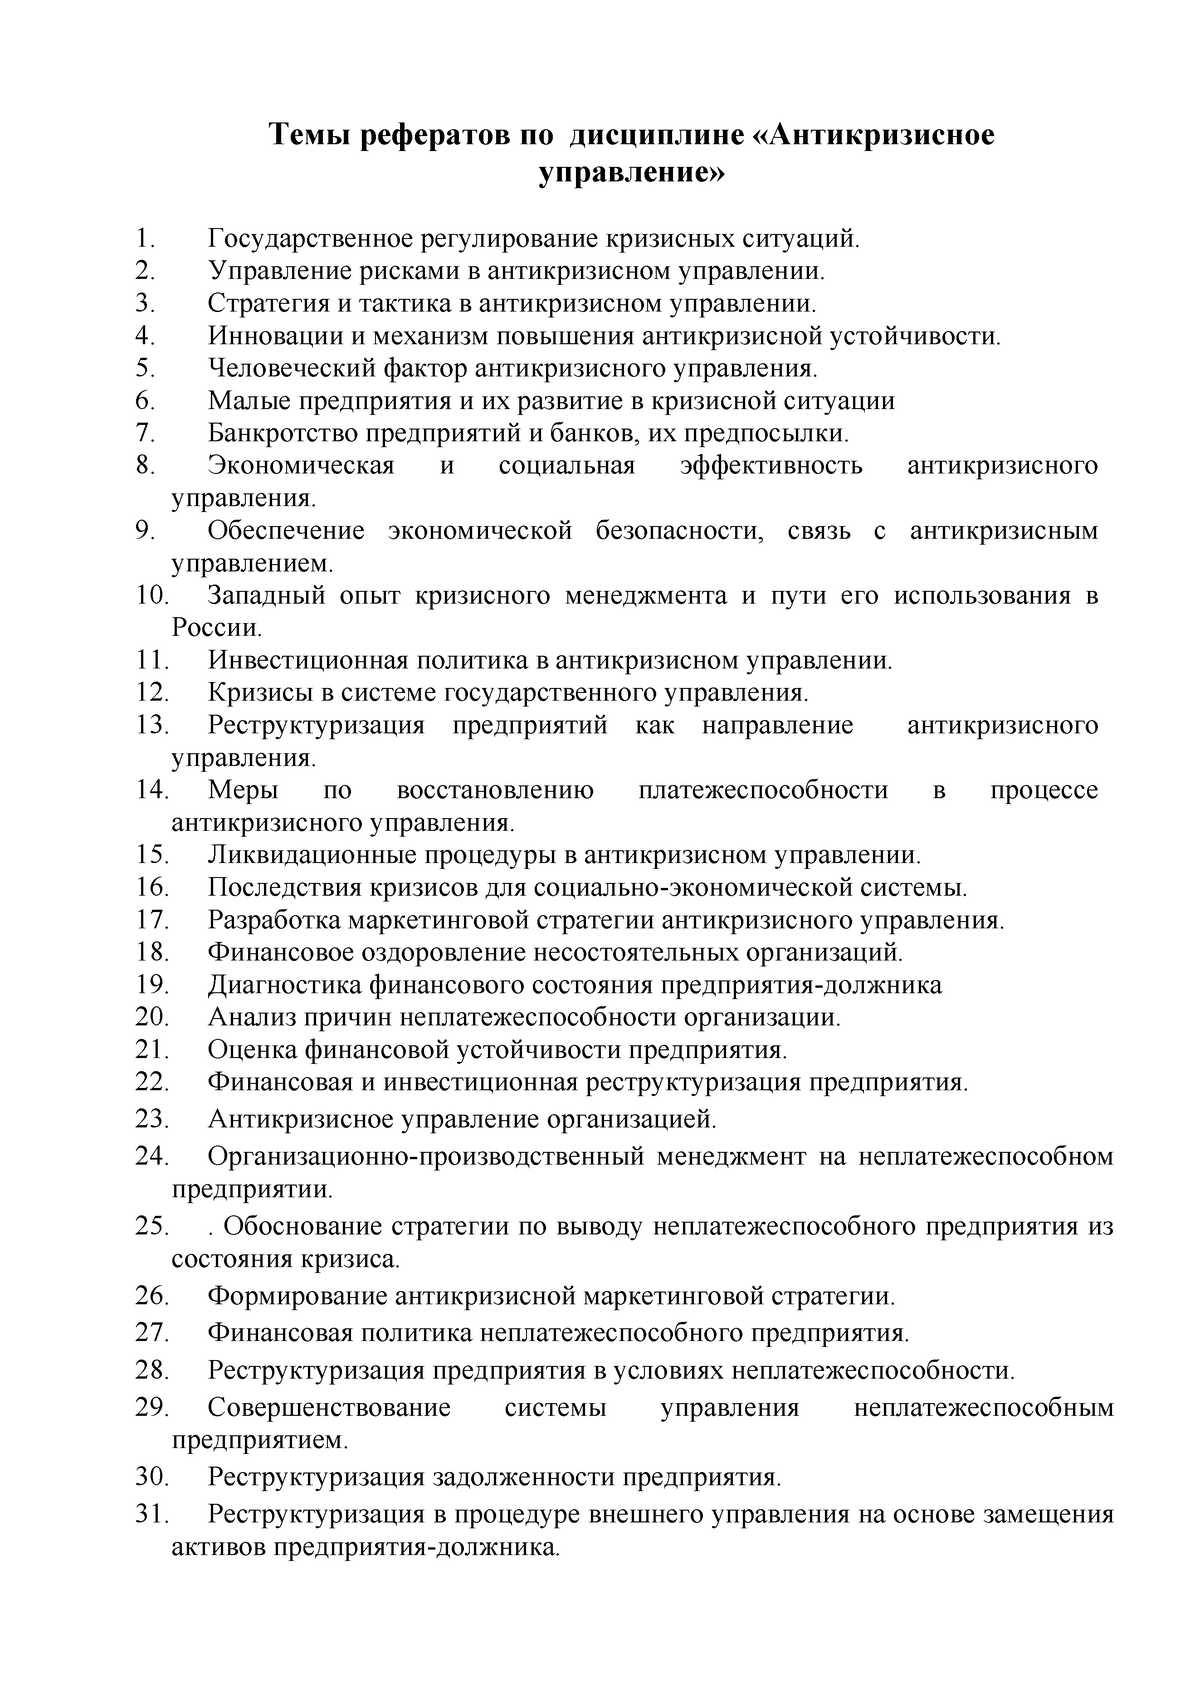 Антикризисное управление предприятий реферат 9298